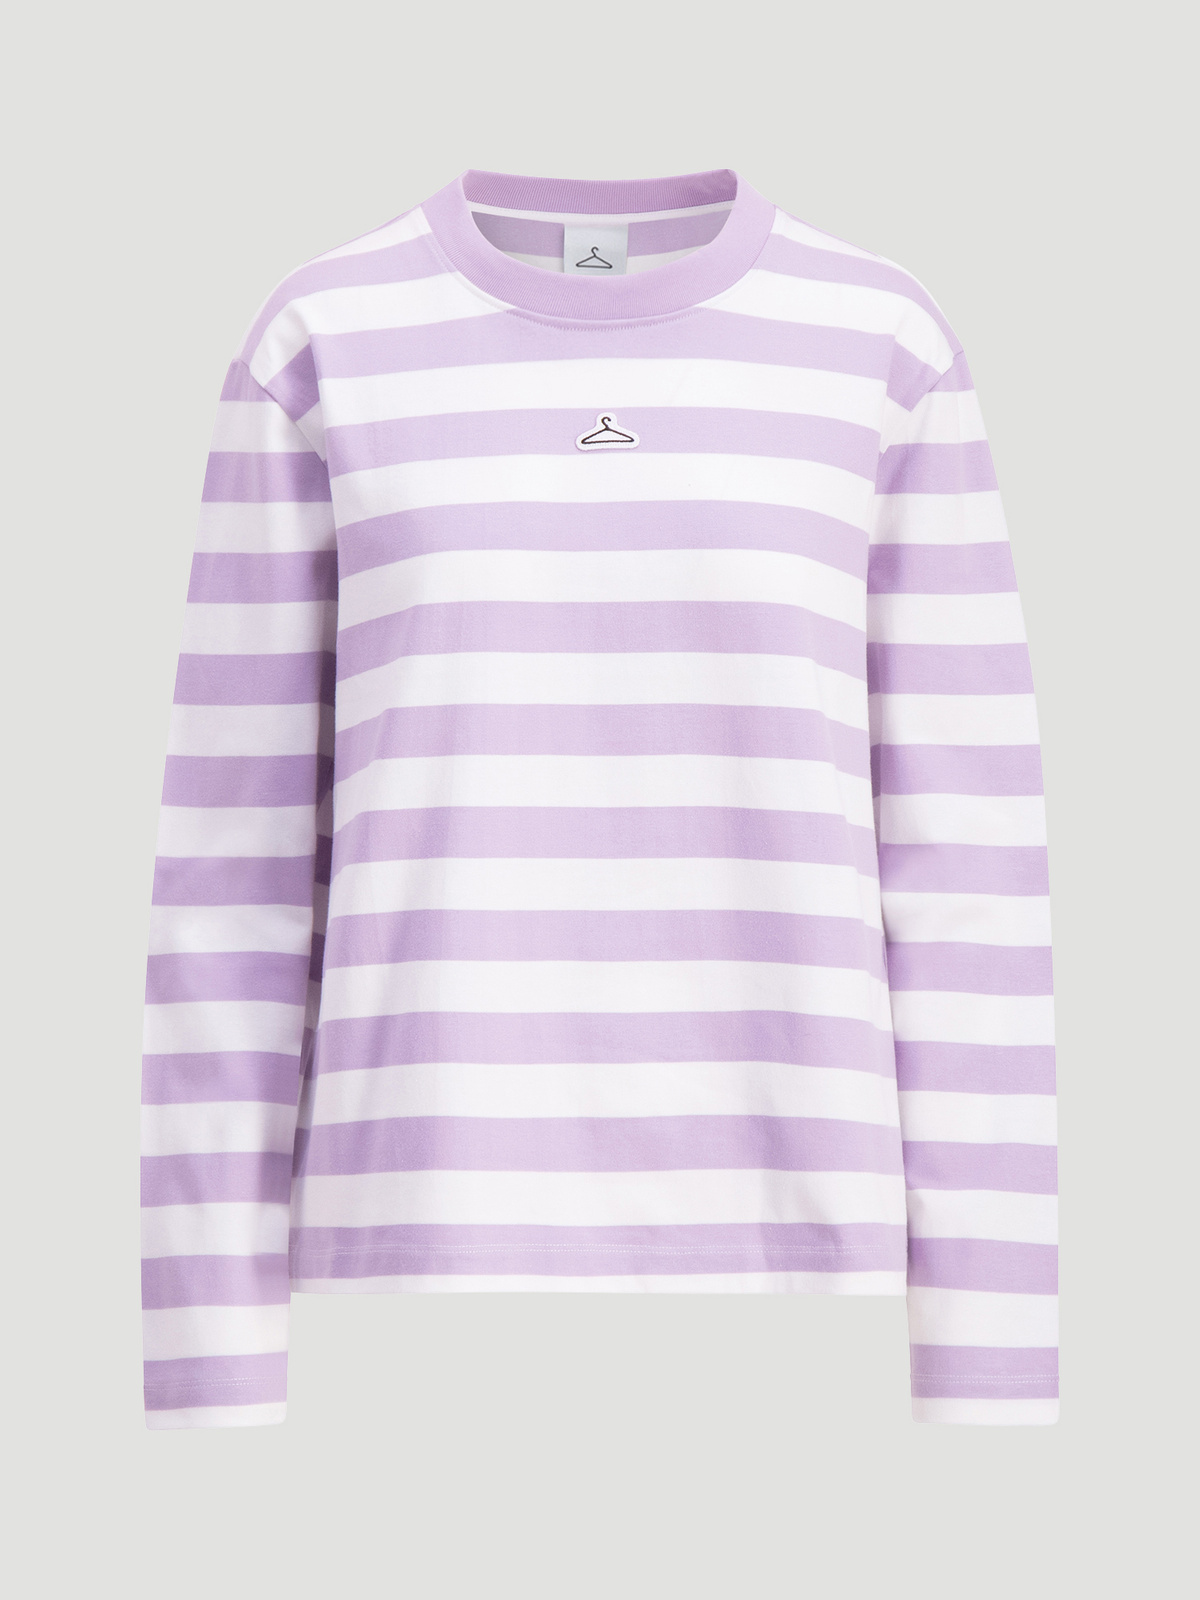 Hanger Striped Longsleeve Lilac White 1